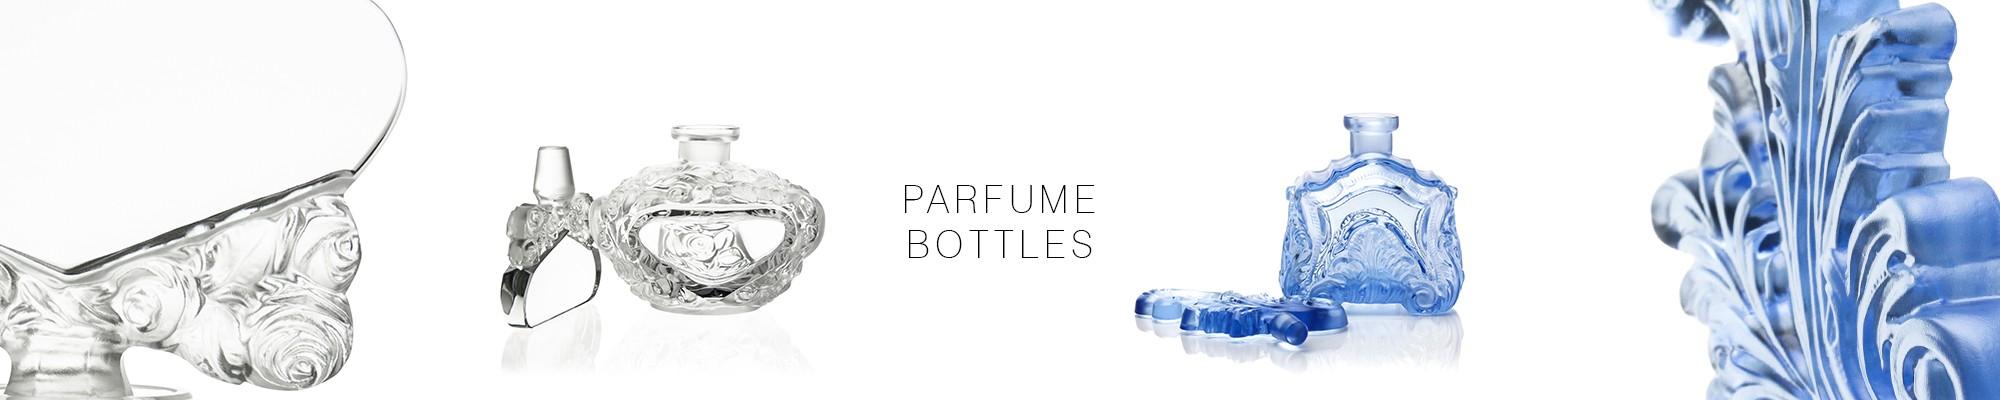 Parfume Bottles